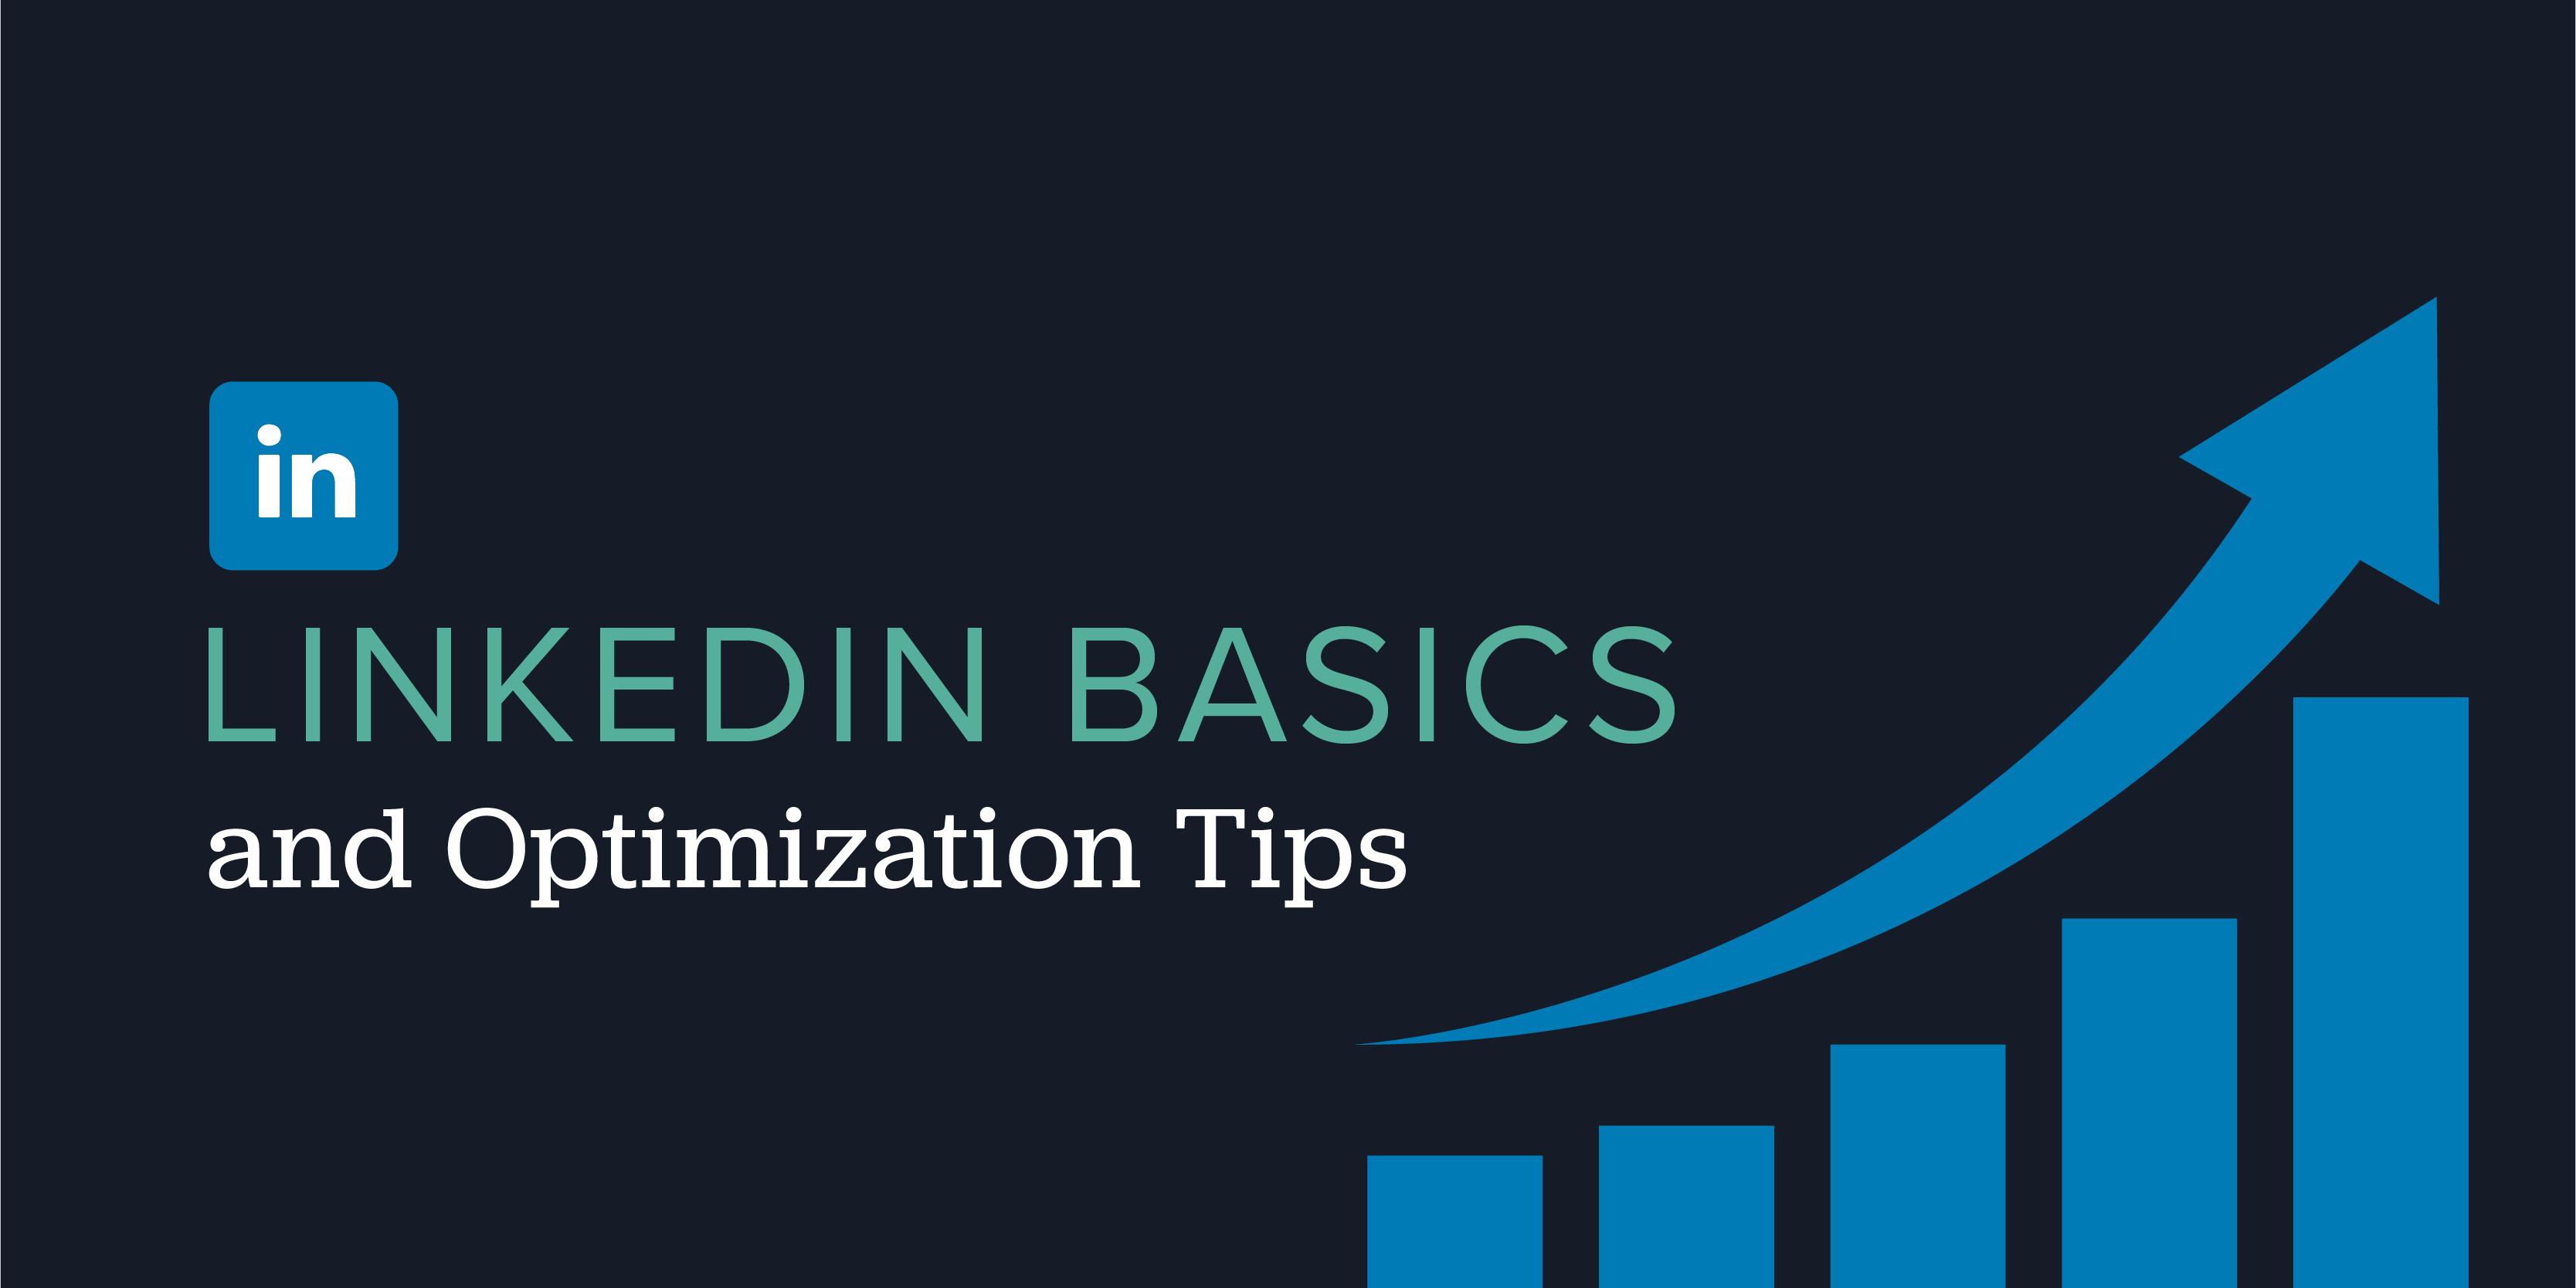 LinkedIn-Basics-Optimization-Tips